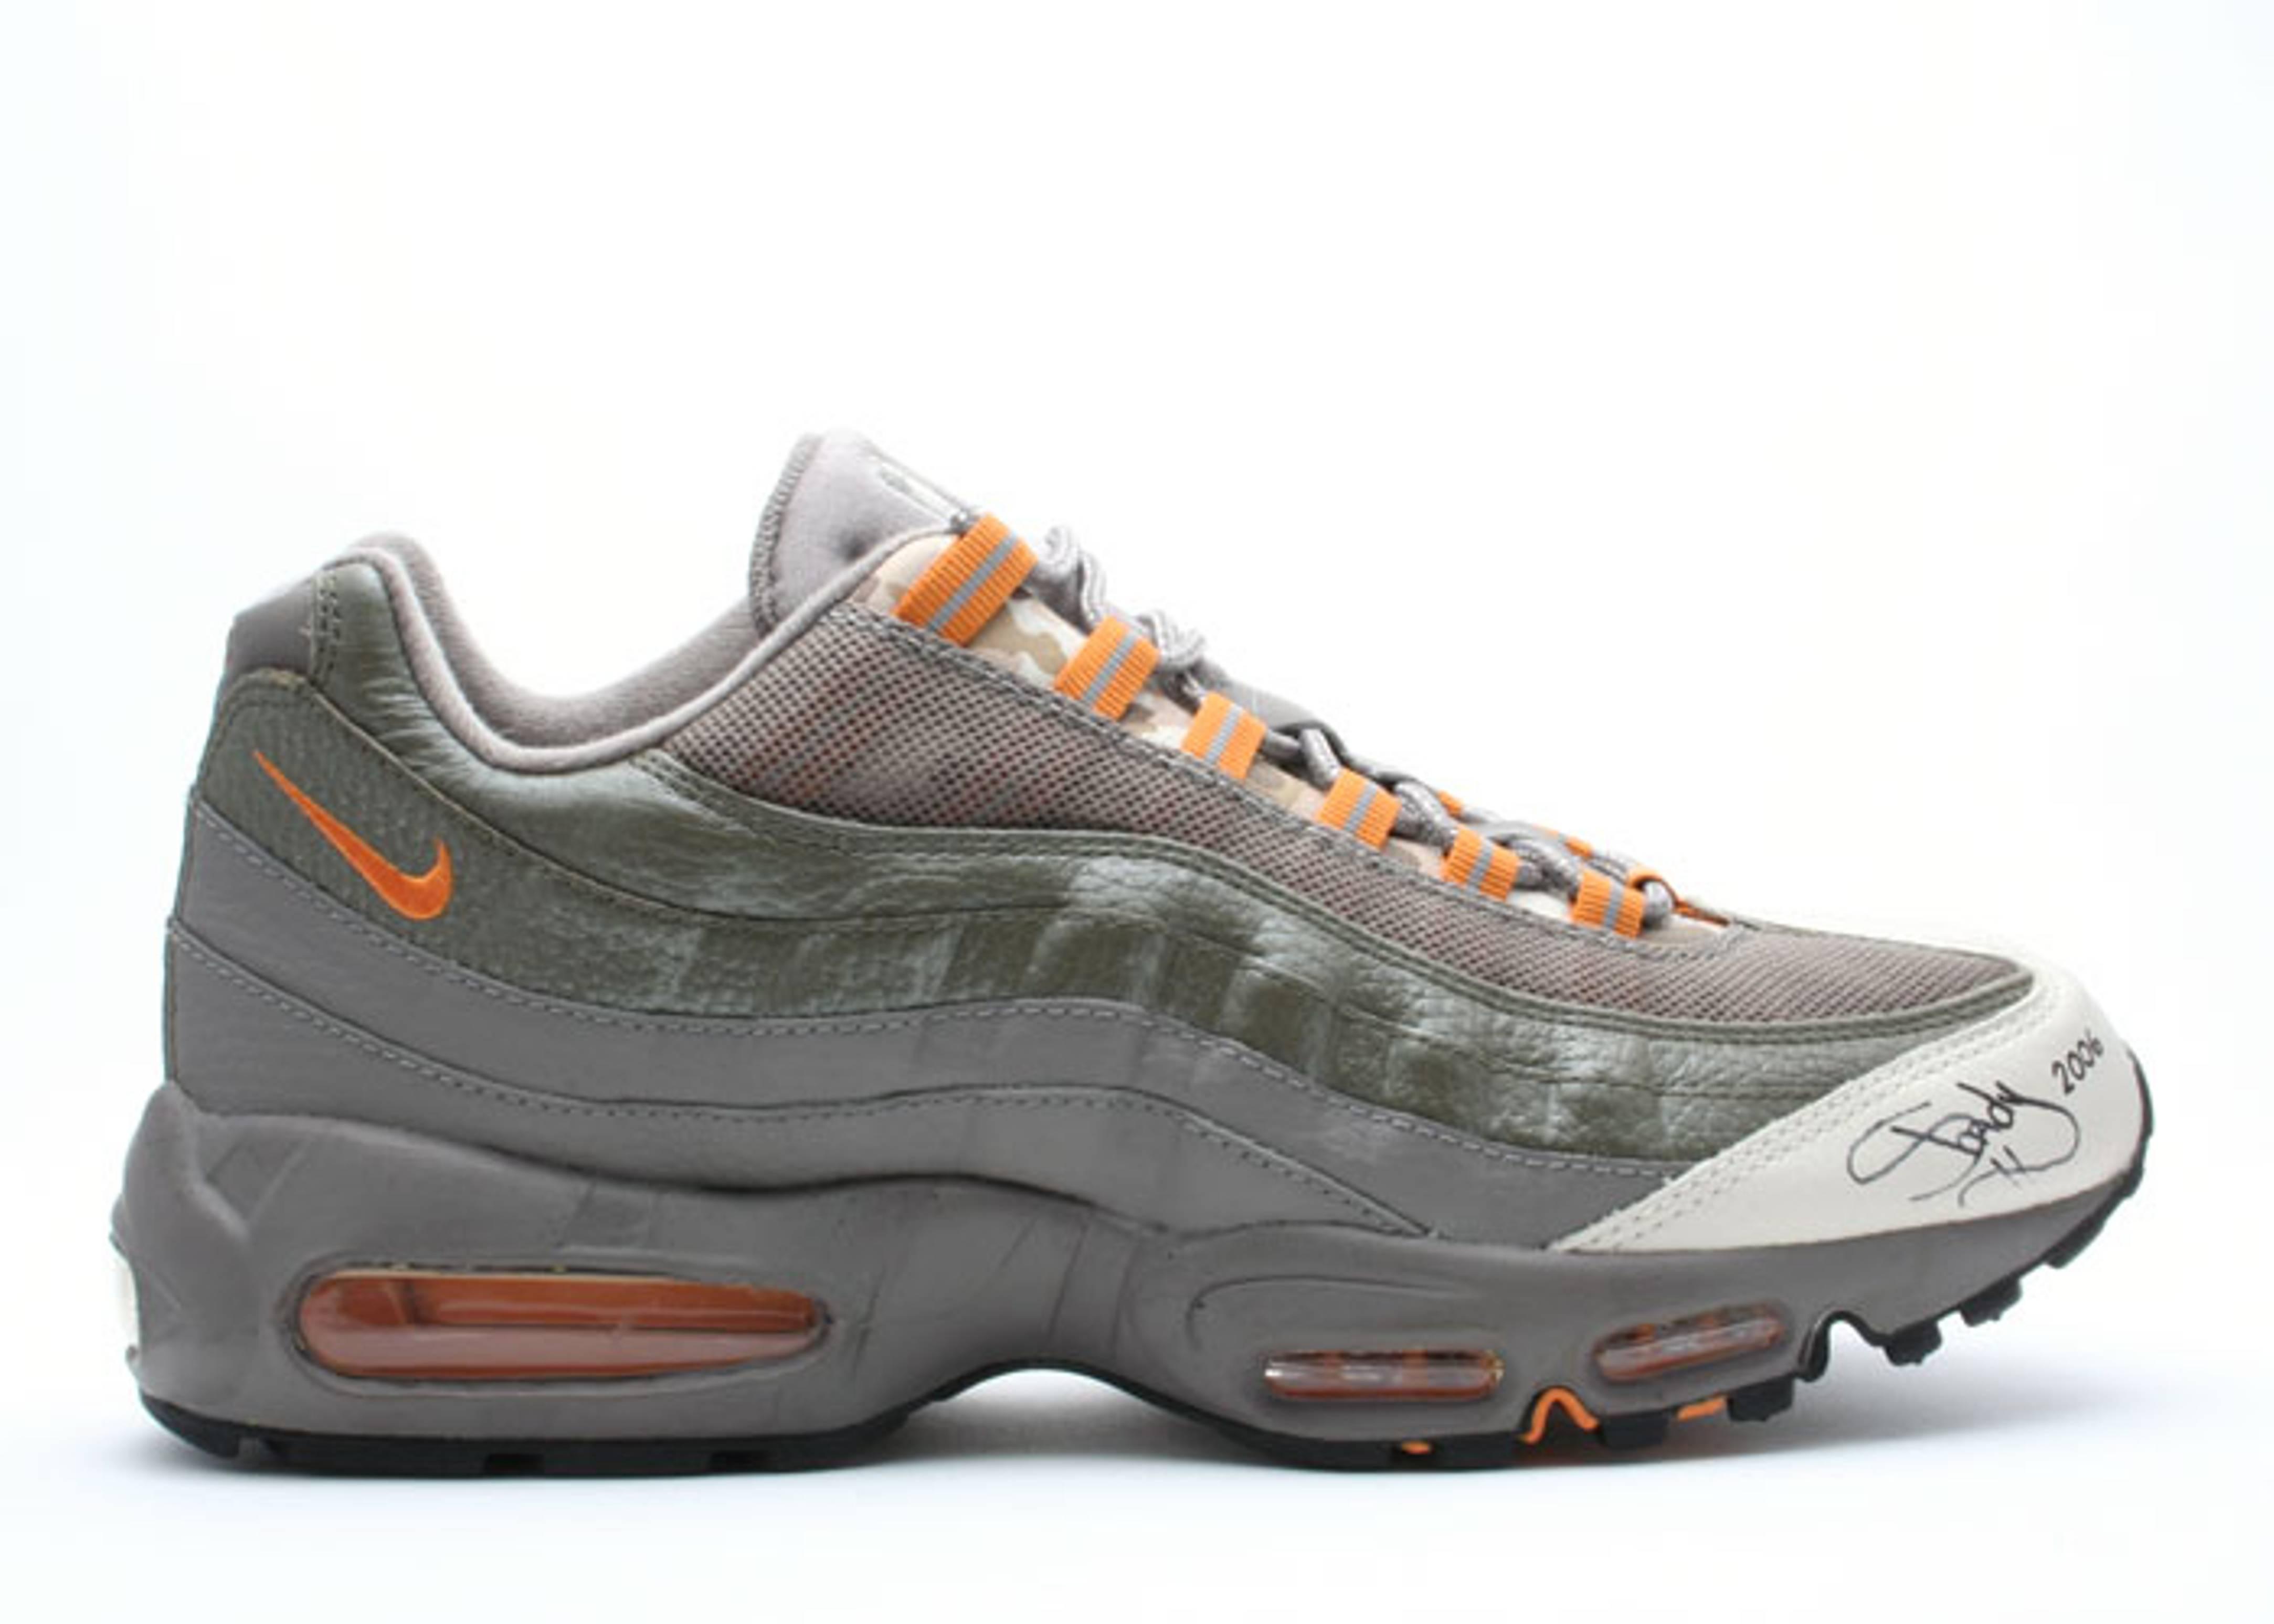 Eminem's Nike Air Max 97 Charity 'Shady Records' Available